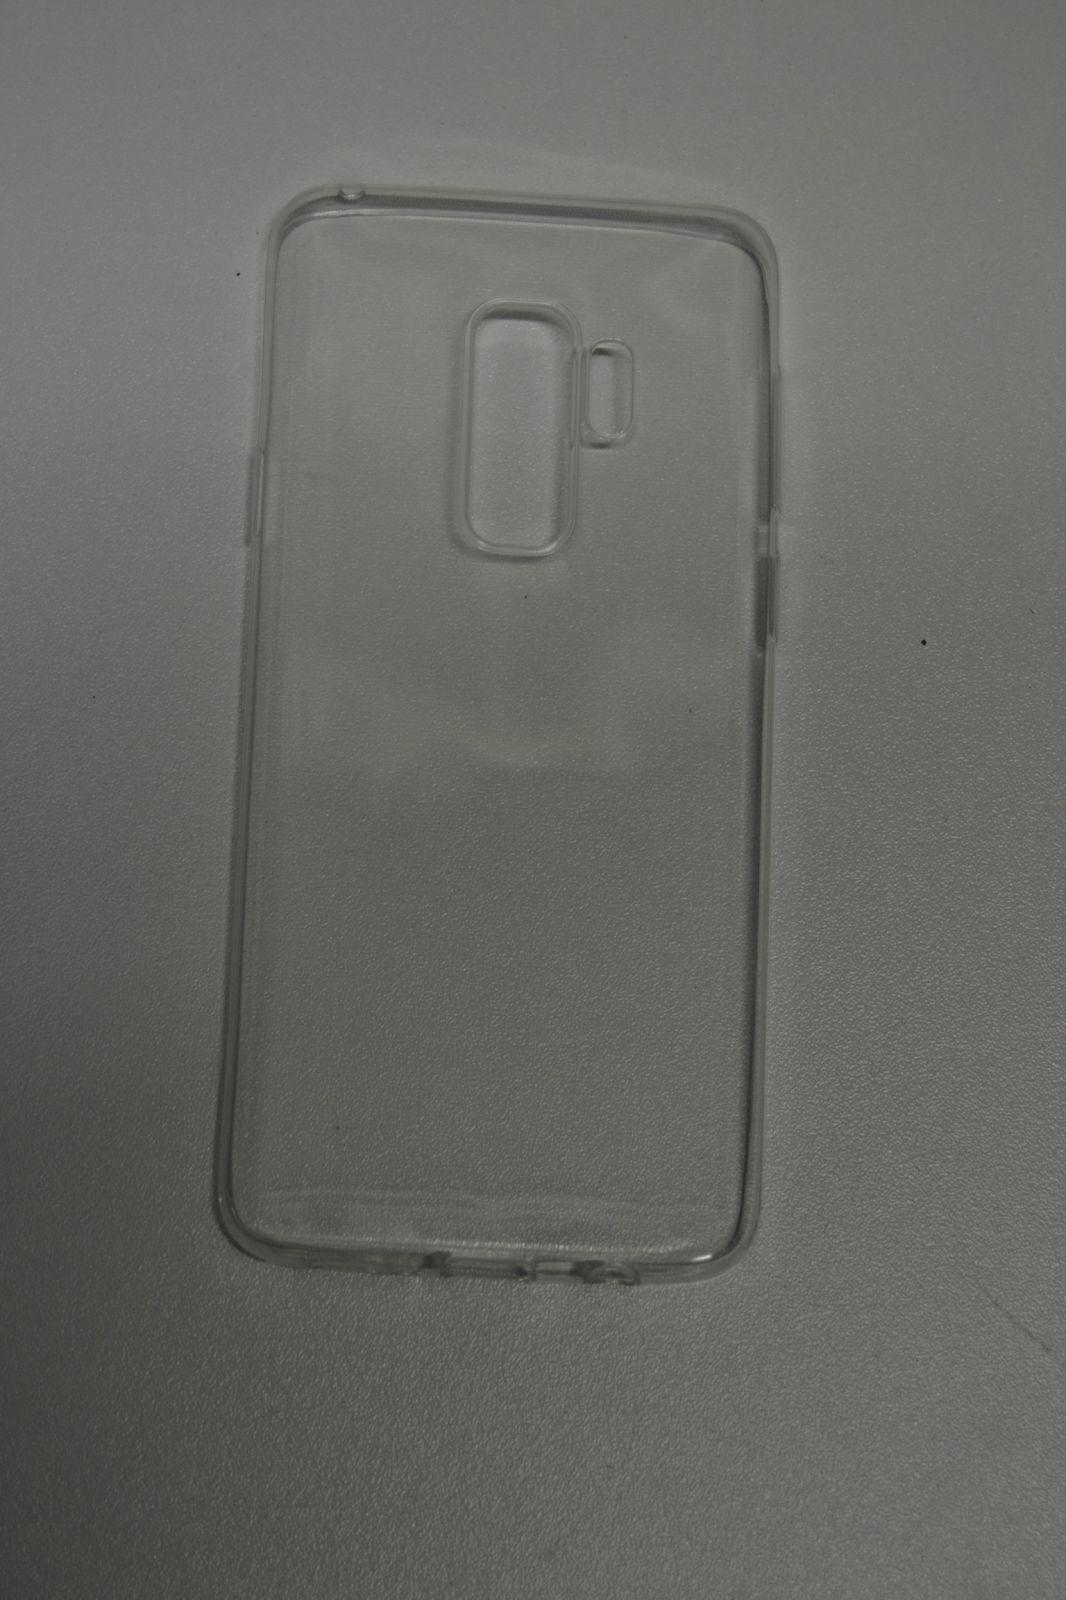 Silikonový kryt na mobilní telefon Samsung Galaxy S9 plus, pouzdro